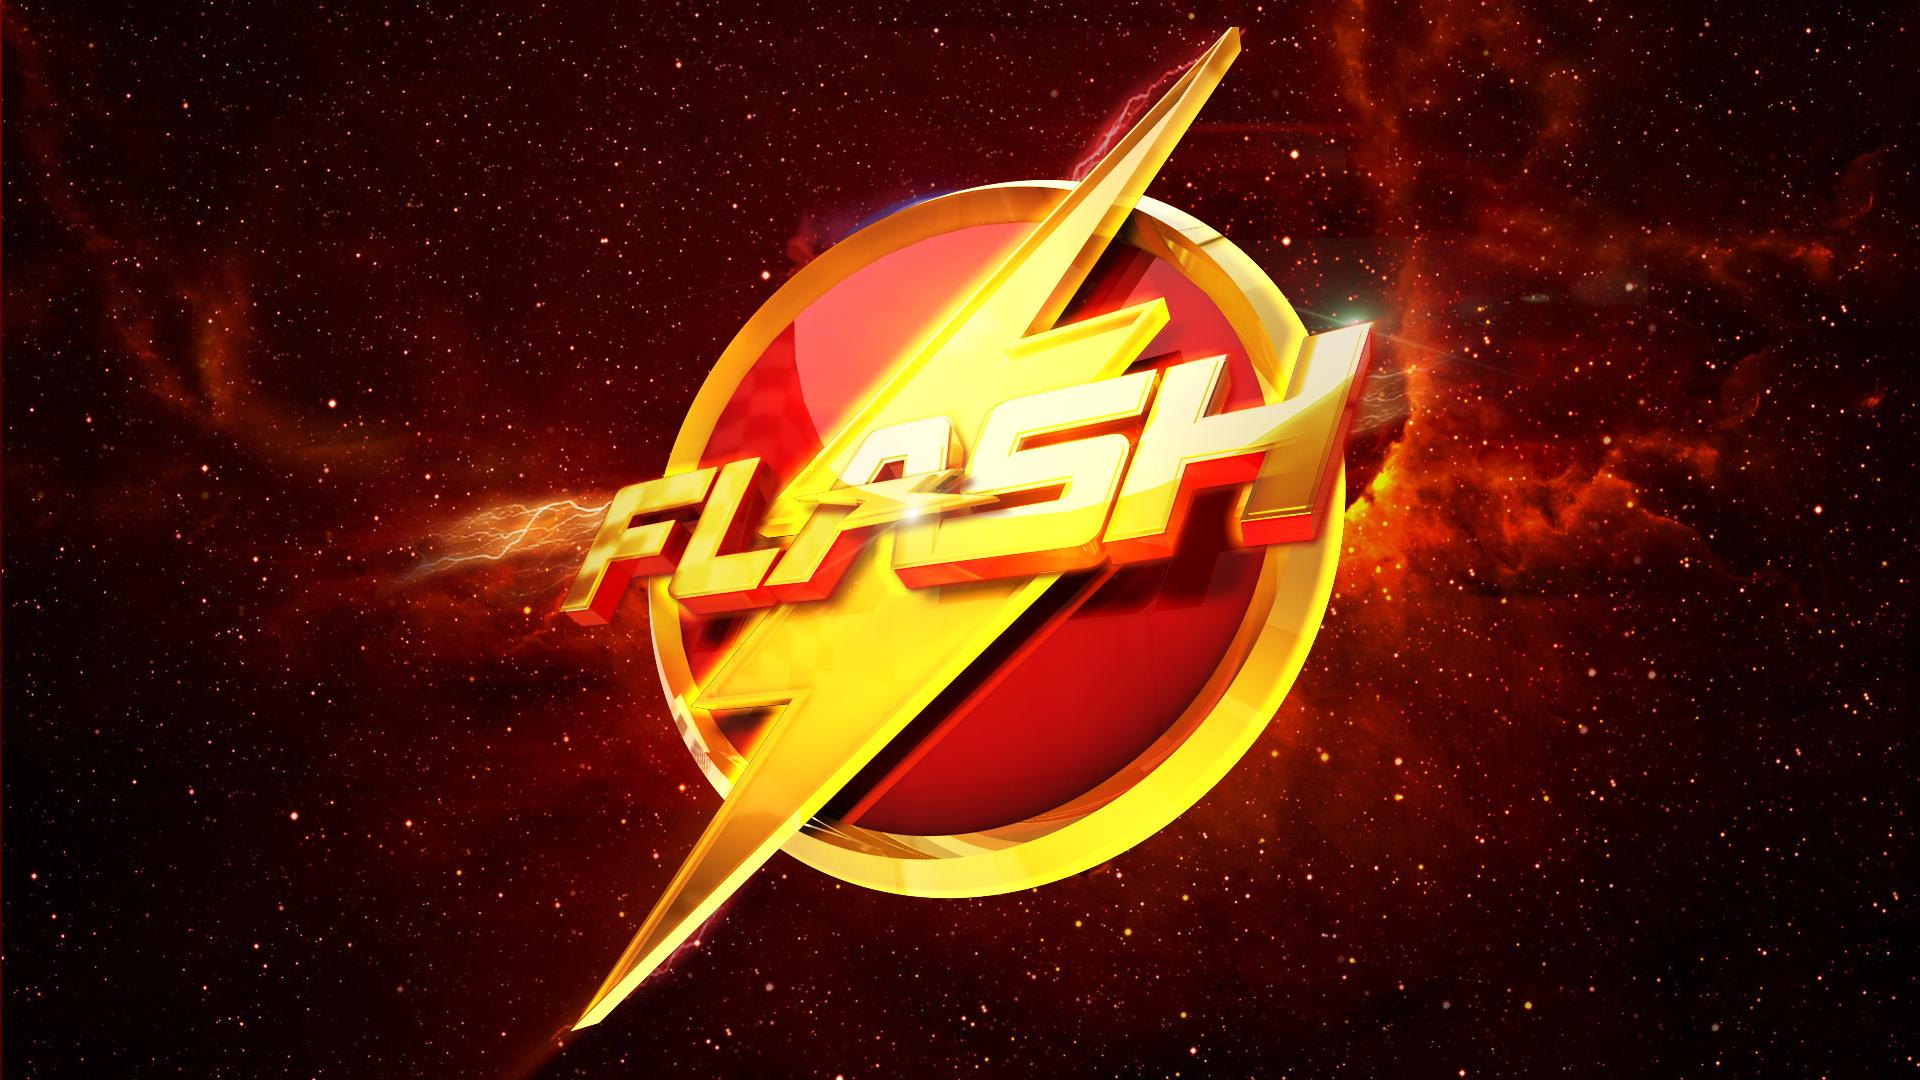 reverse flash wallpaper